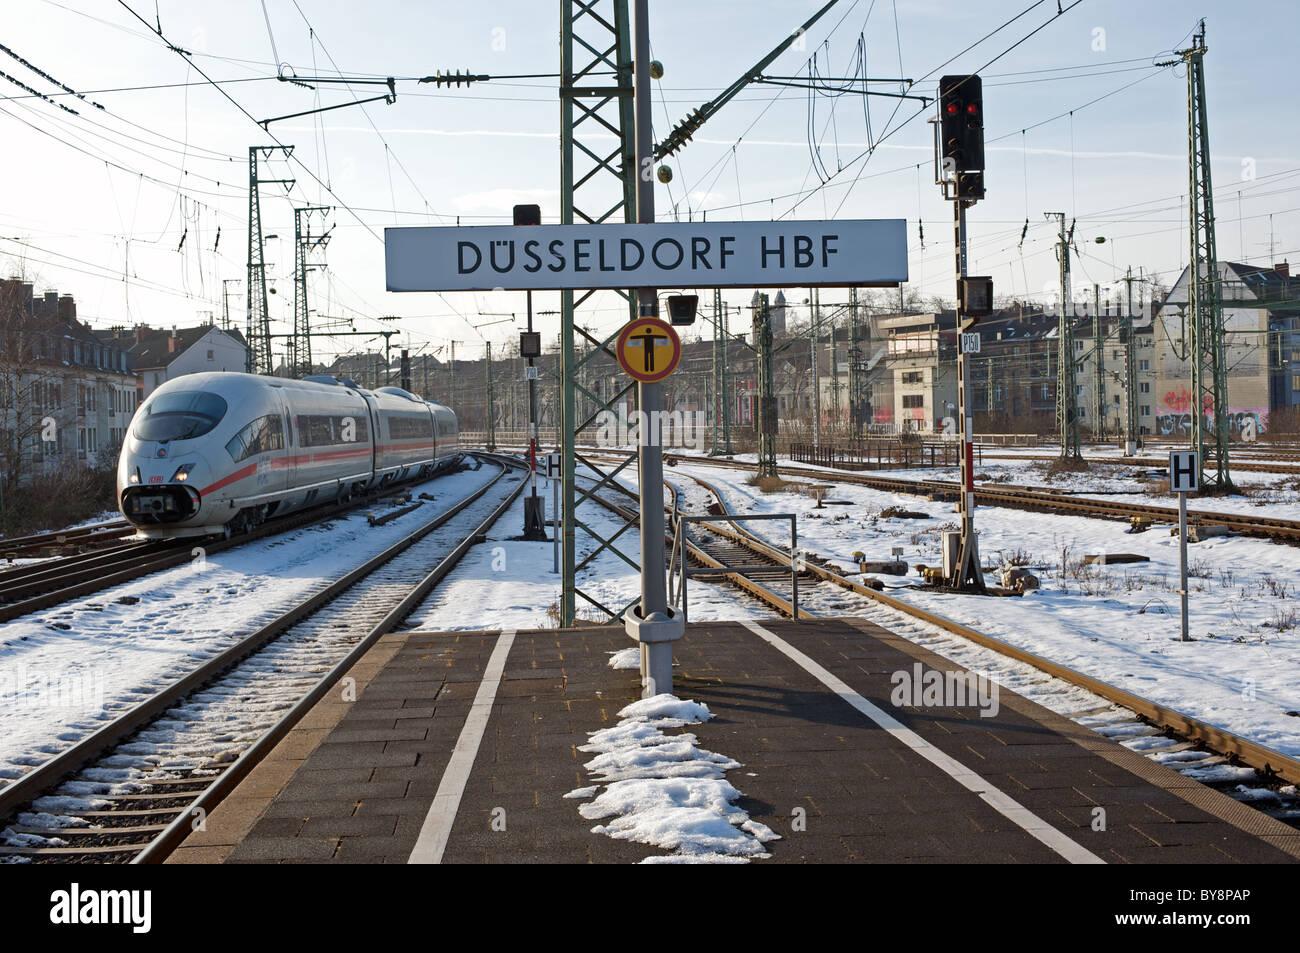 german railways intercity express ice dusseldorf hbf main railway stock photo royalty free. Black Bedroom Furniture Sets. Home Design Ideas